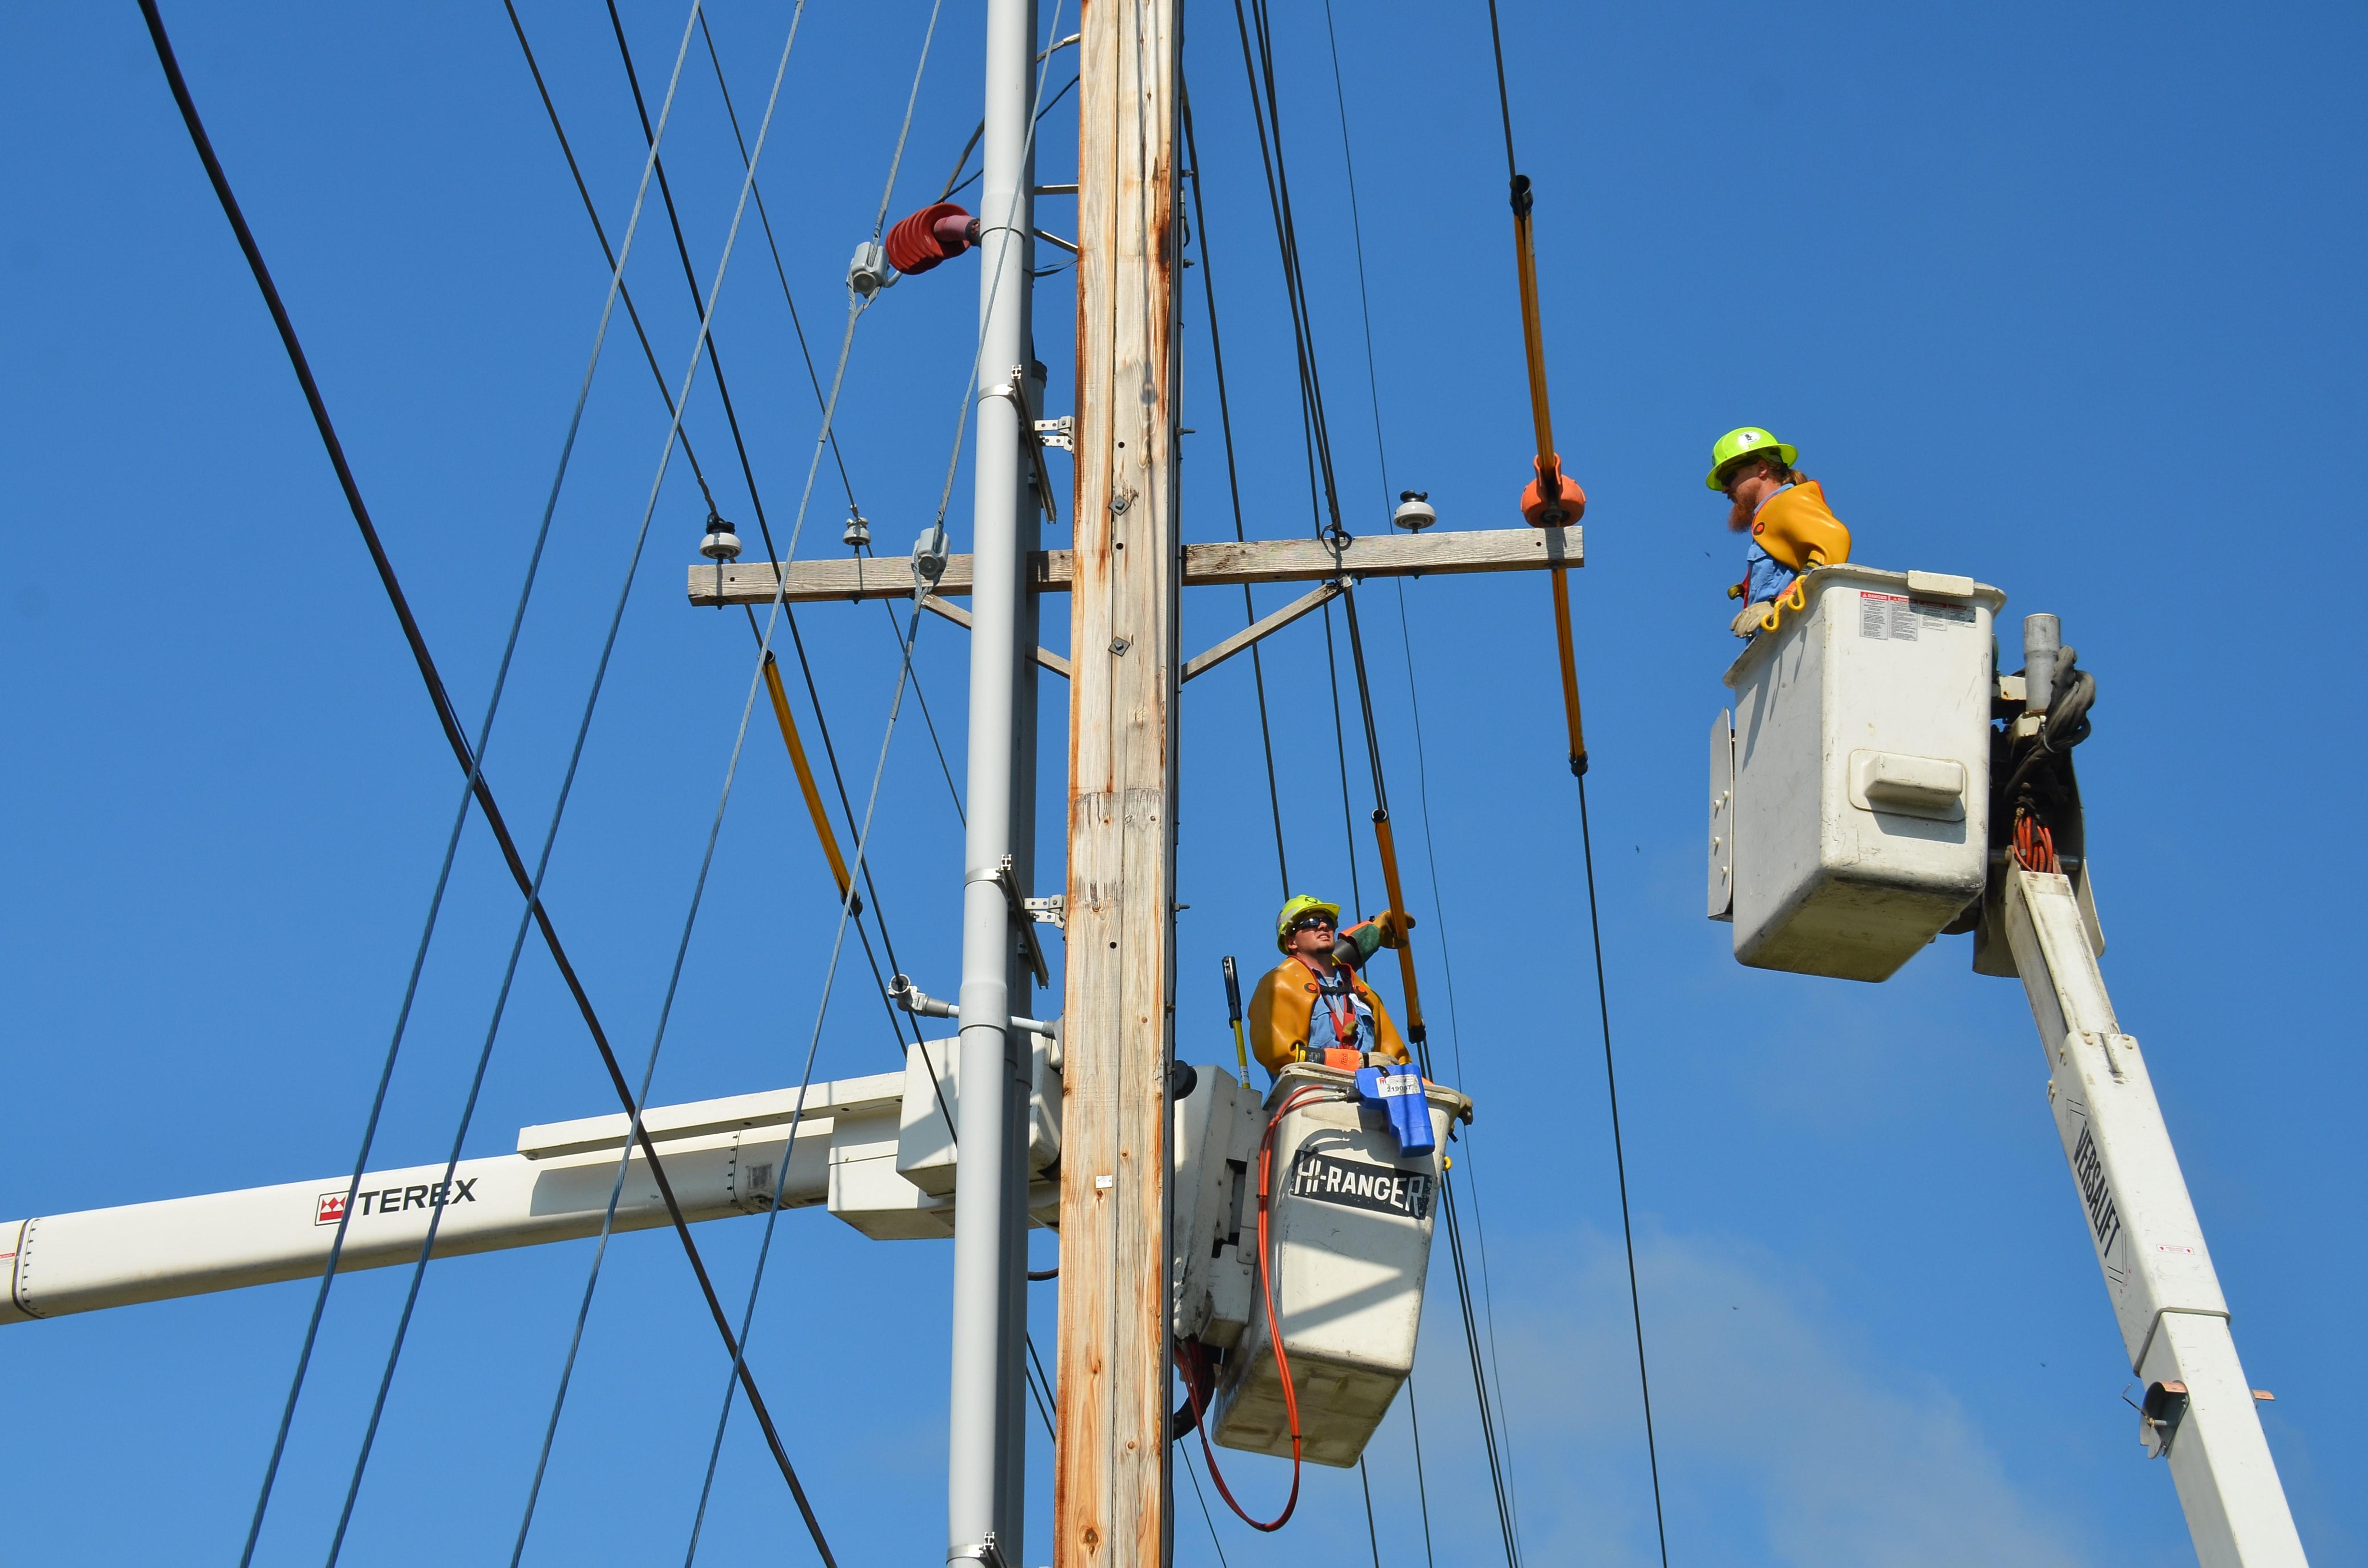 linemen repairing power lines